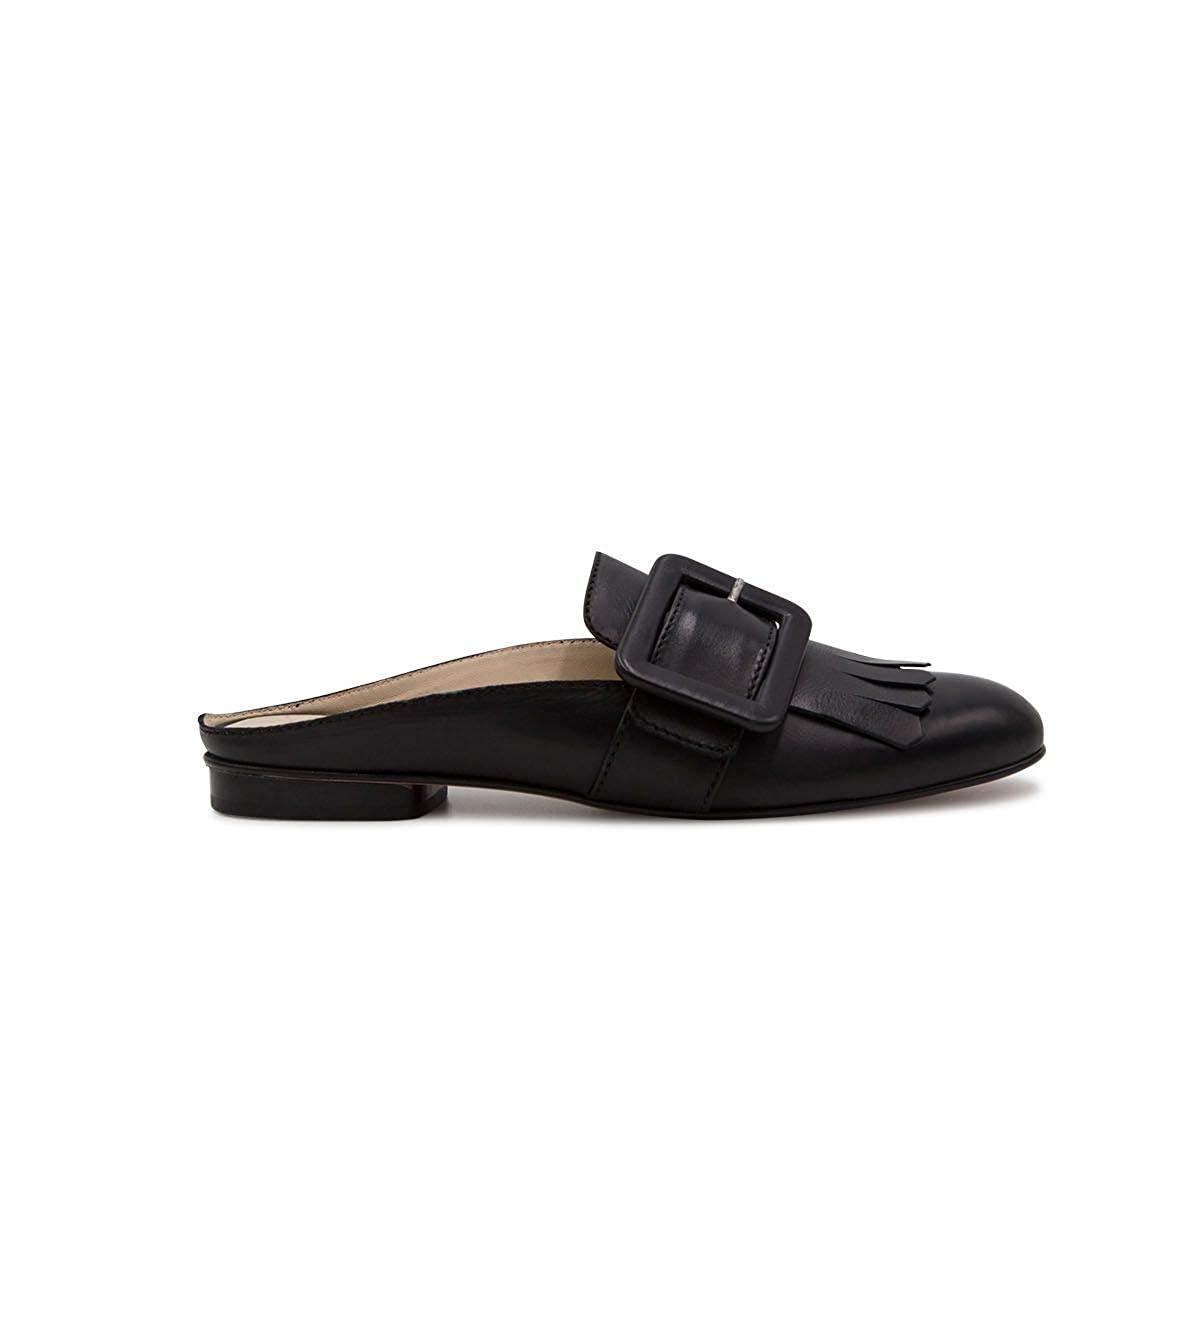 LA SELLERIE Womens 2627BLACK Black Leather Loafers